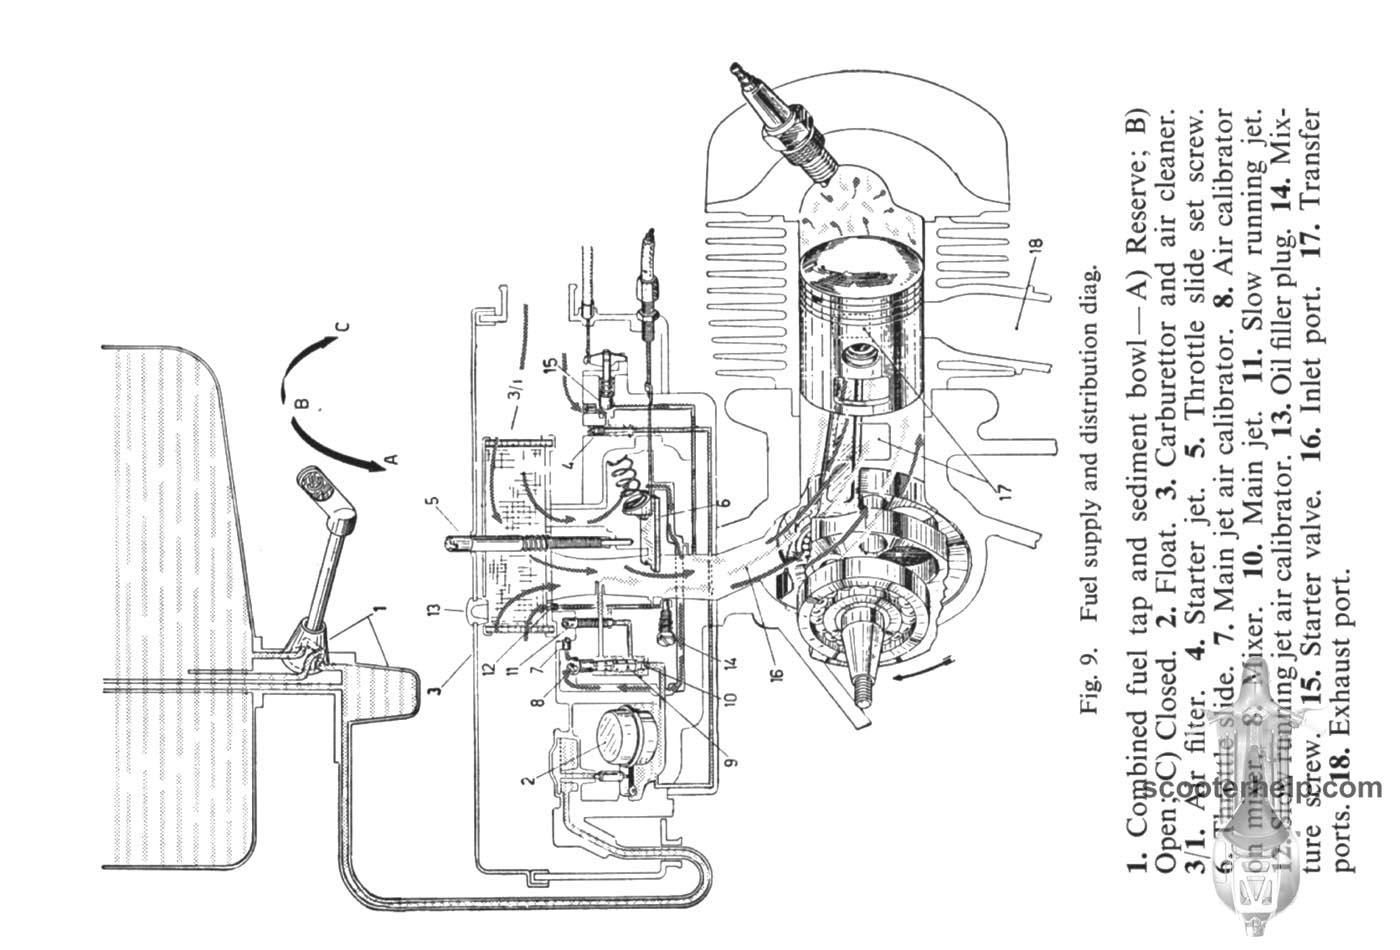 Vespa 150 Sprint Owner's Manual